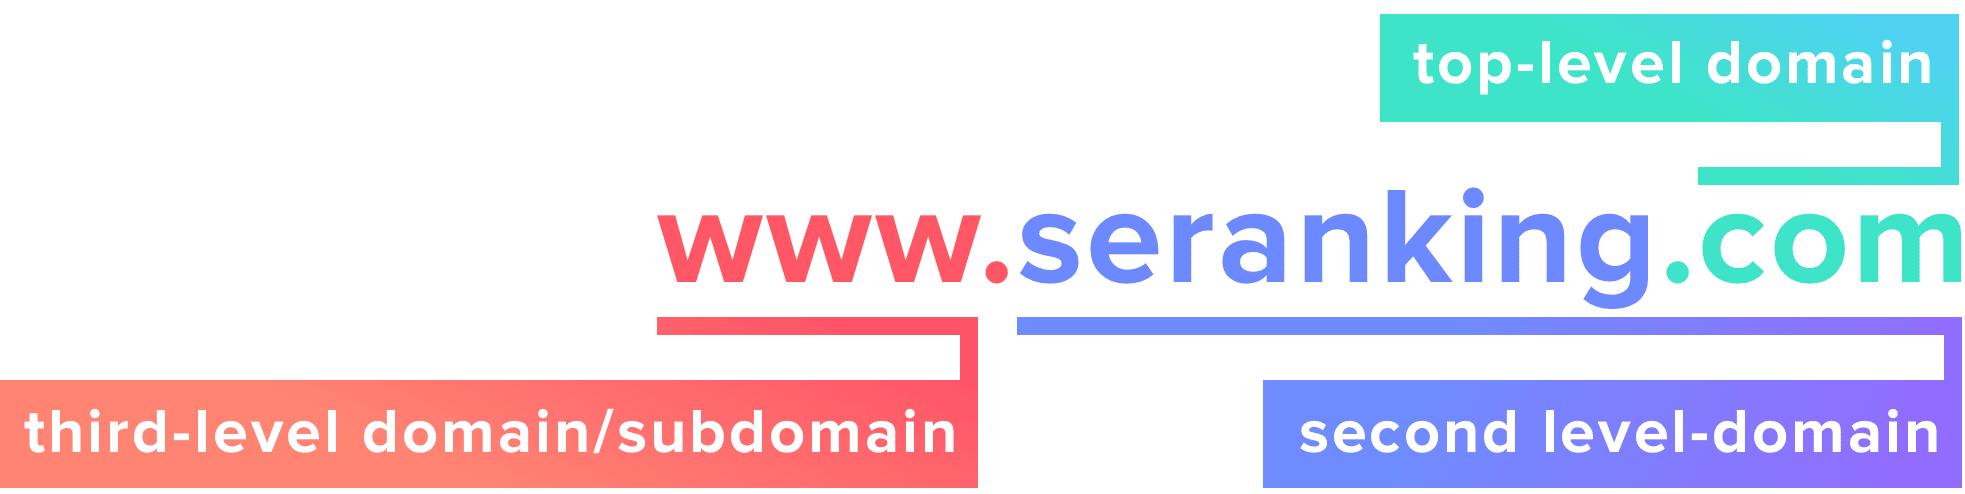 www-seranking-com-domain-structure